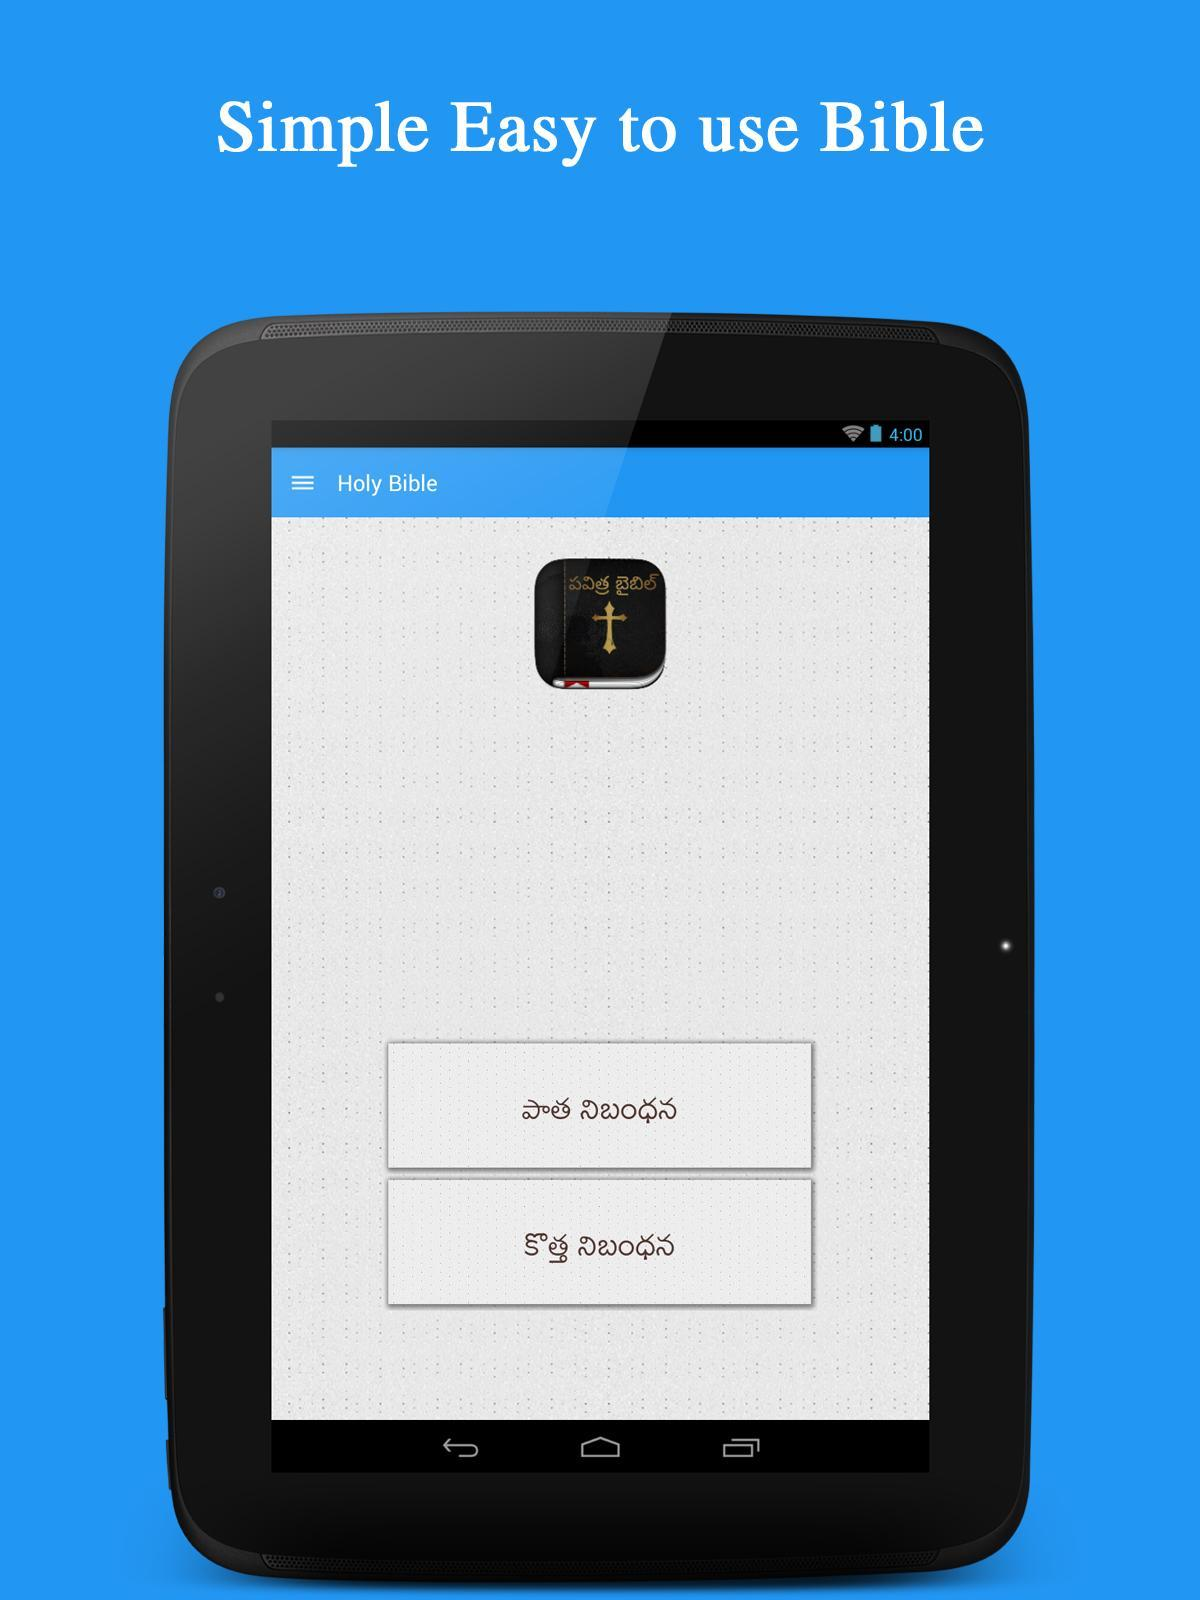 Telugu Bible ( పవిత్ర బైబిల్ ) for Android - APK